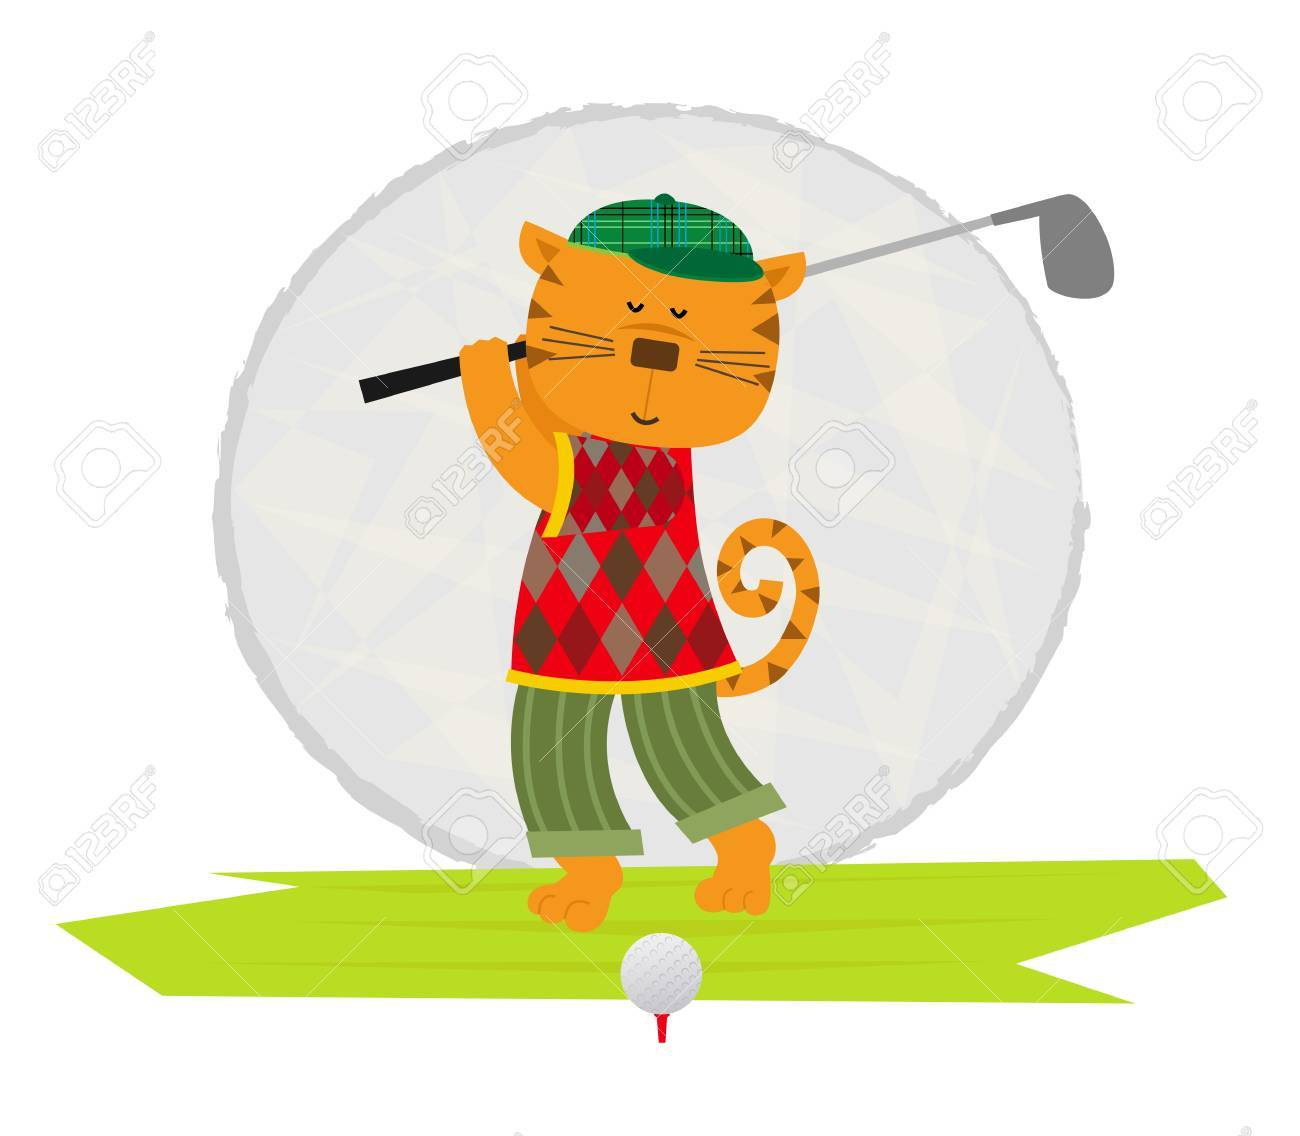 hight resolution of cartoon clip art of a cat playing golf stock vector 57658855